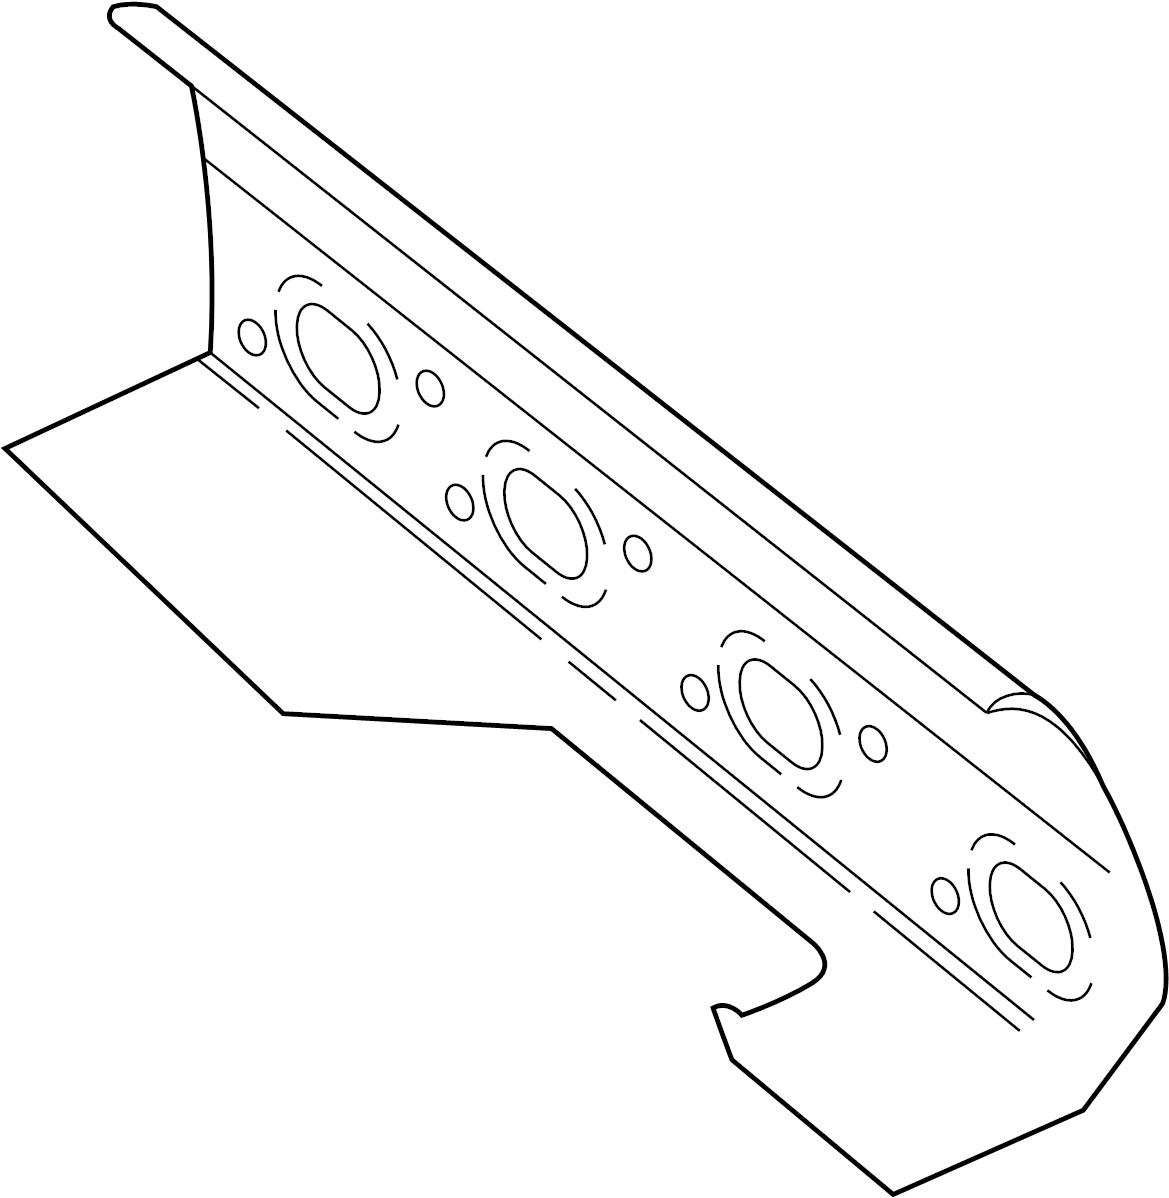 Jaguar Xk8 Exhaust Manifold Gasket Right System